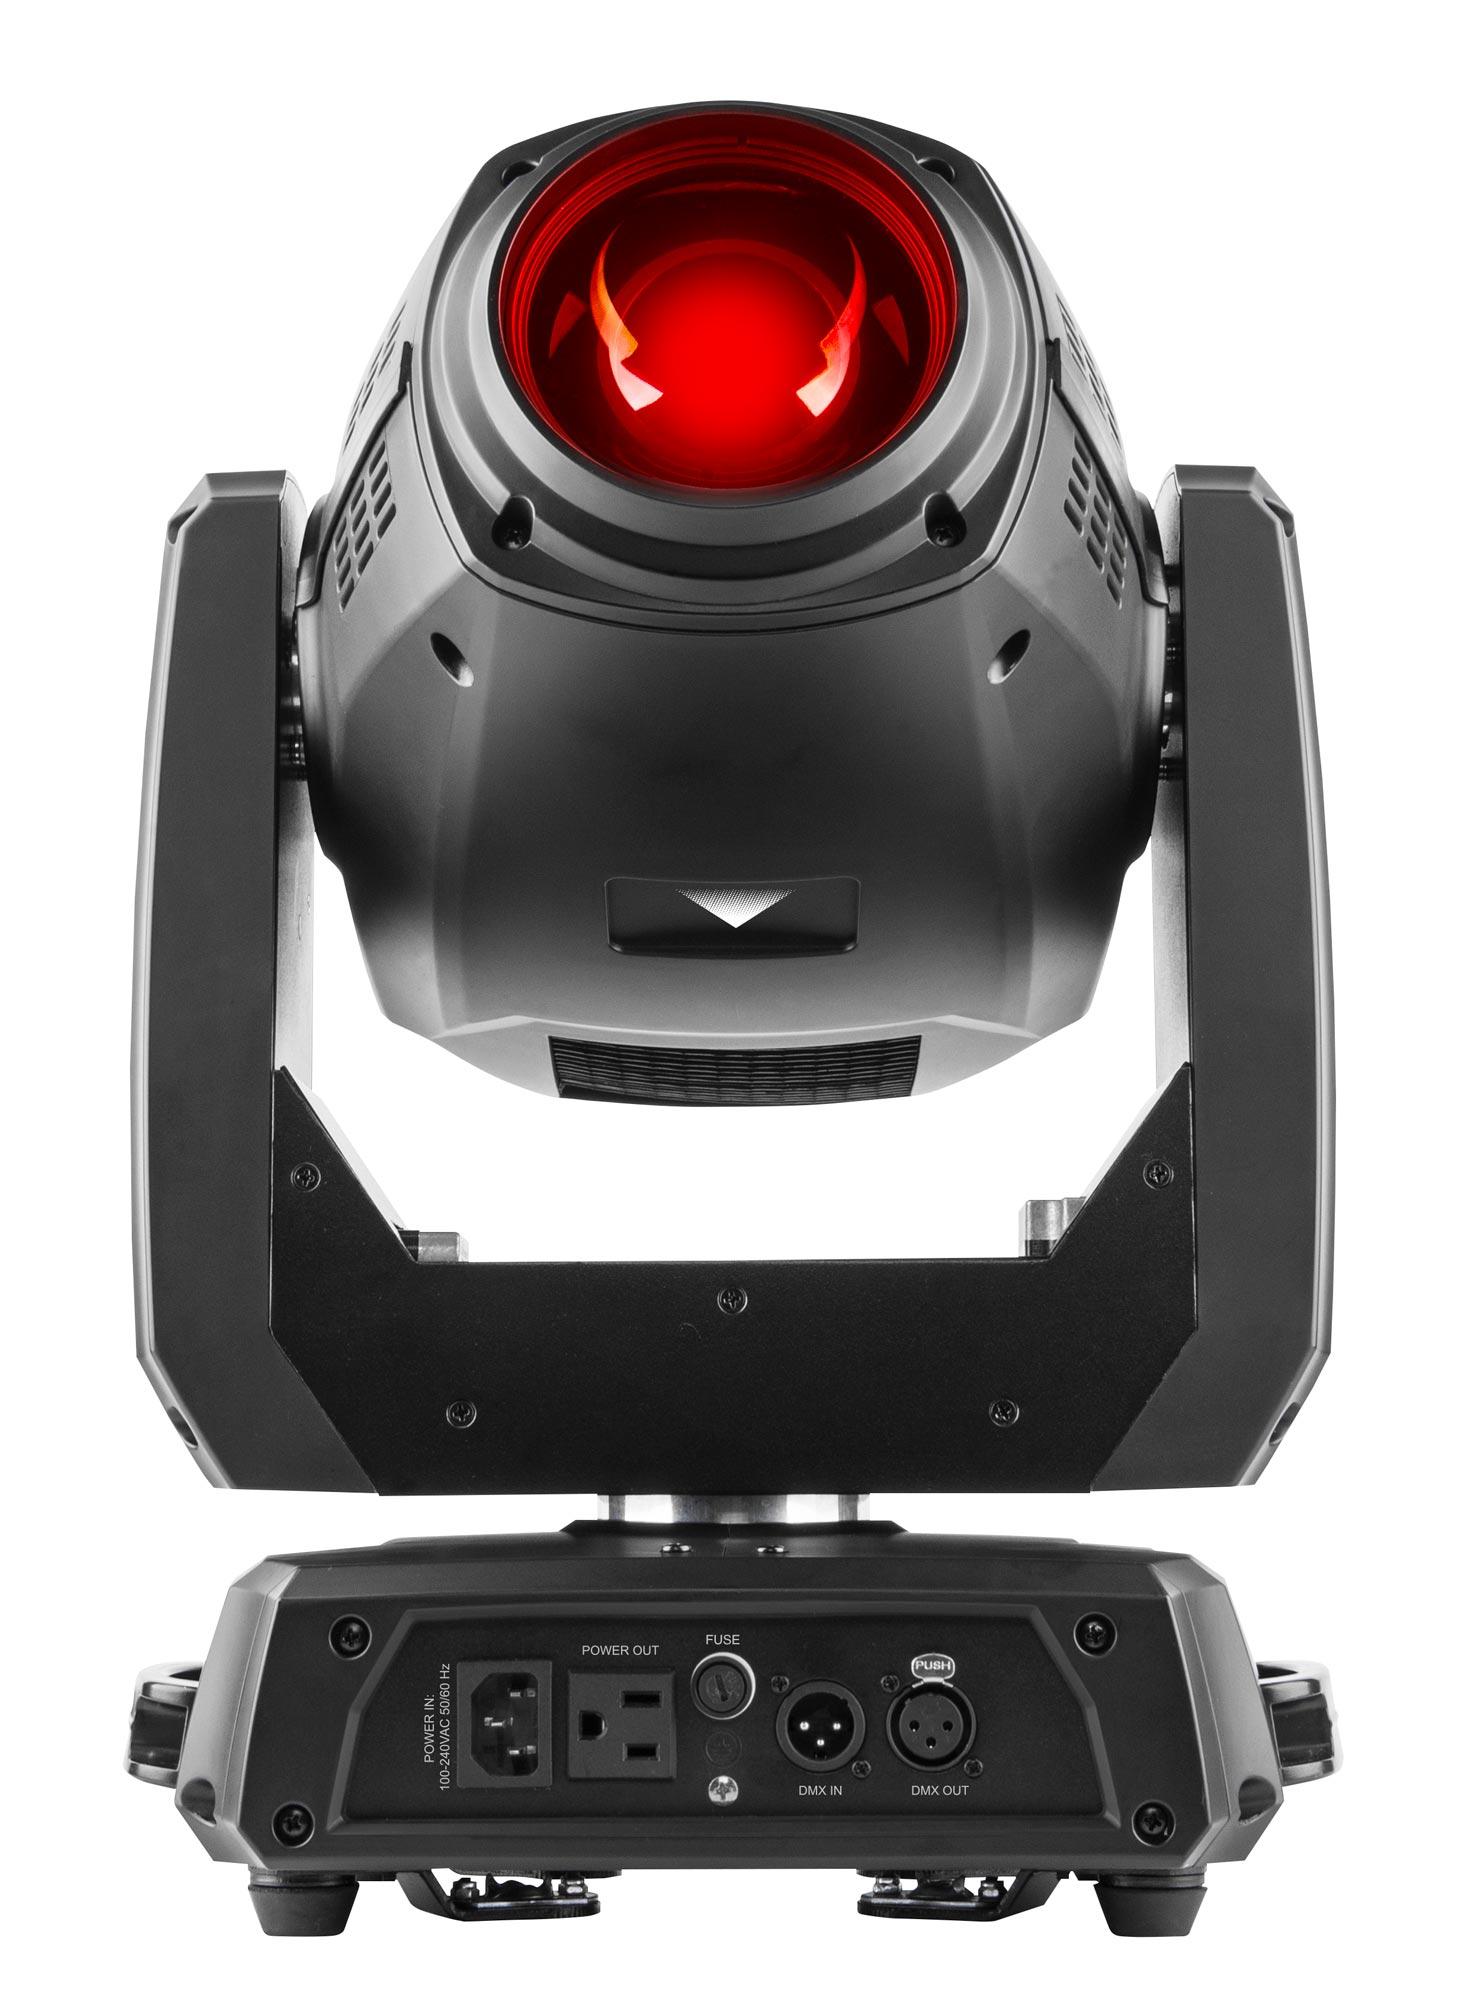 Chauvet intimidator hybrid 140sr spot wash beam all in one moving head